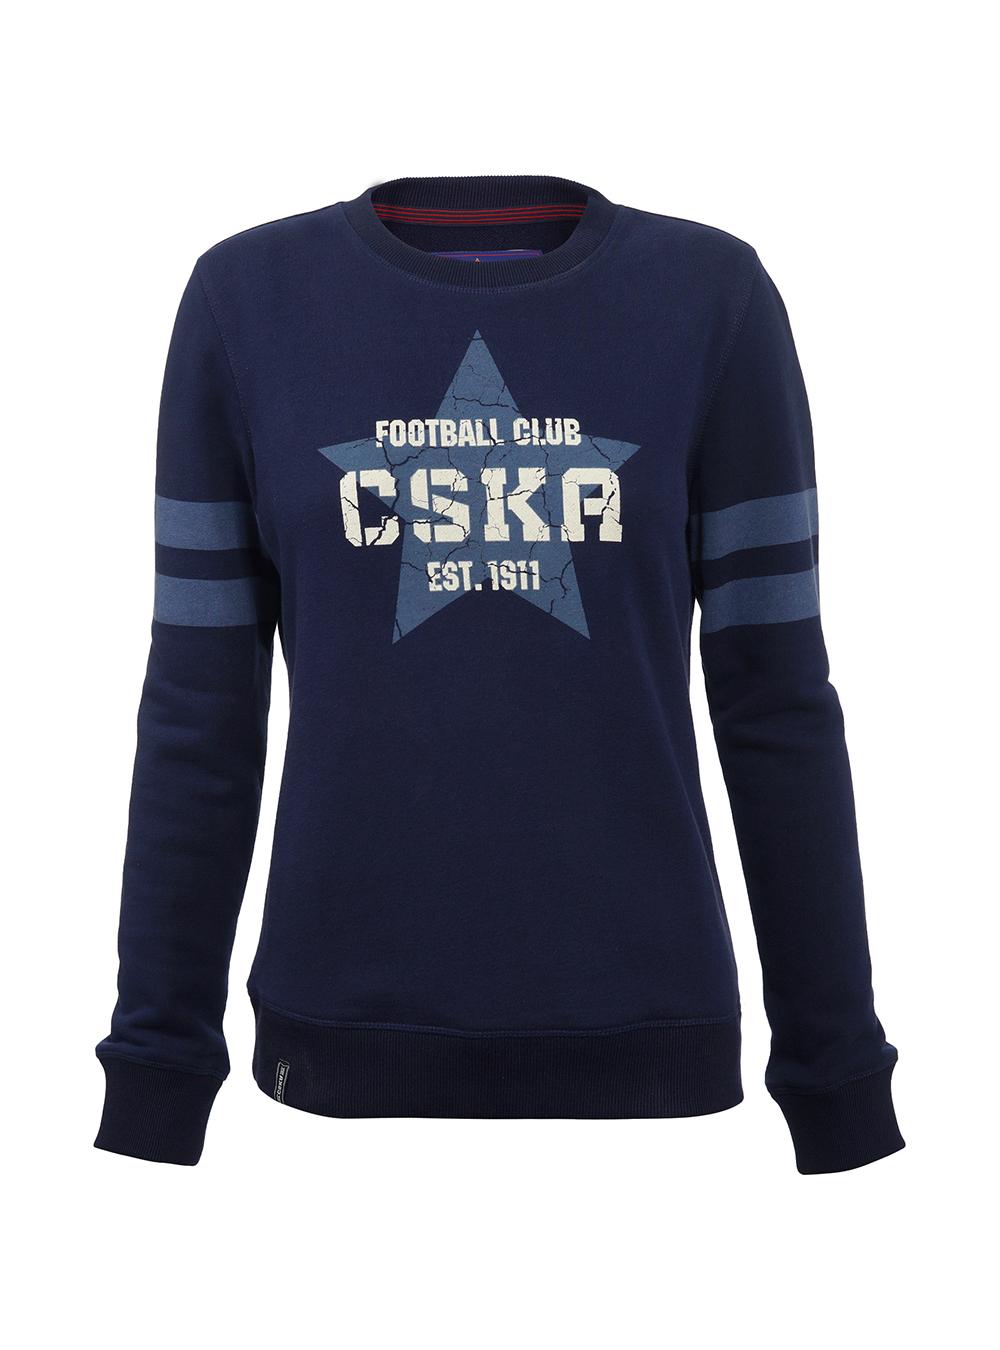 Свитшот ПФК ЦСКА Звезда, синий, S фото